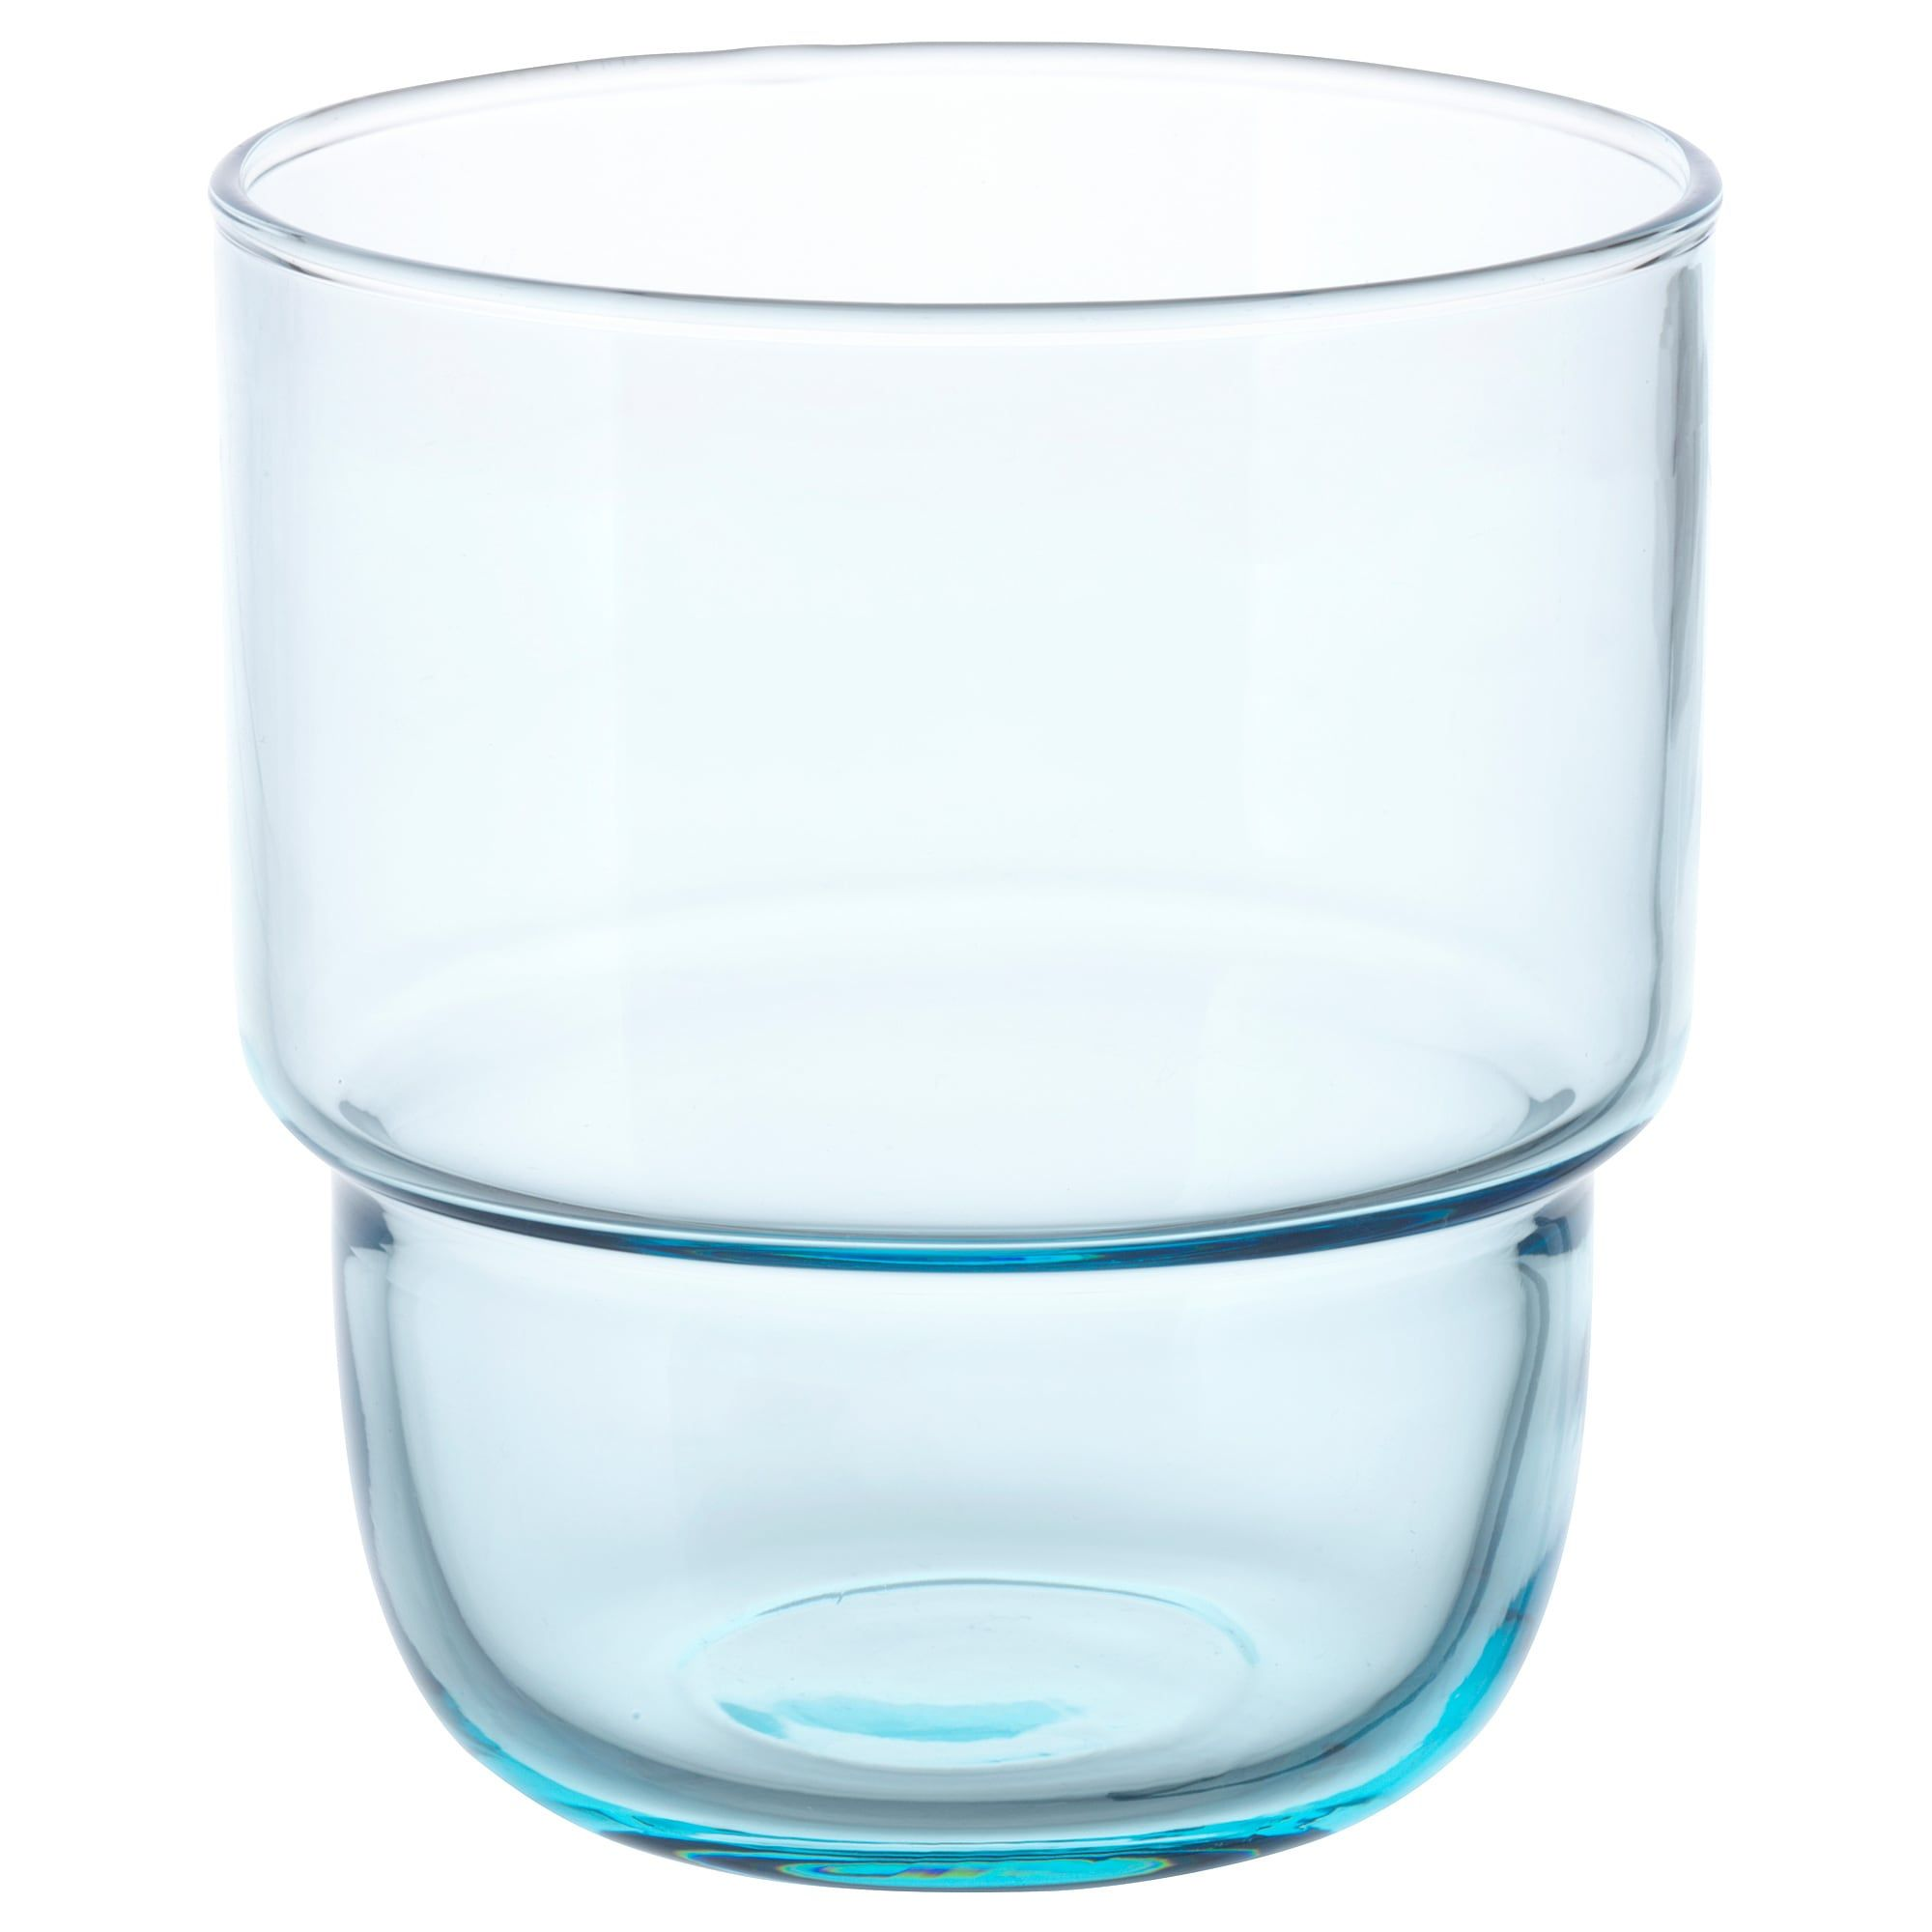 verre ikea bleu clair